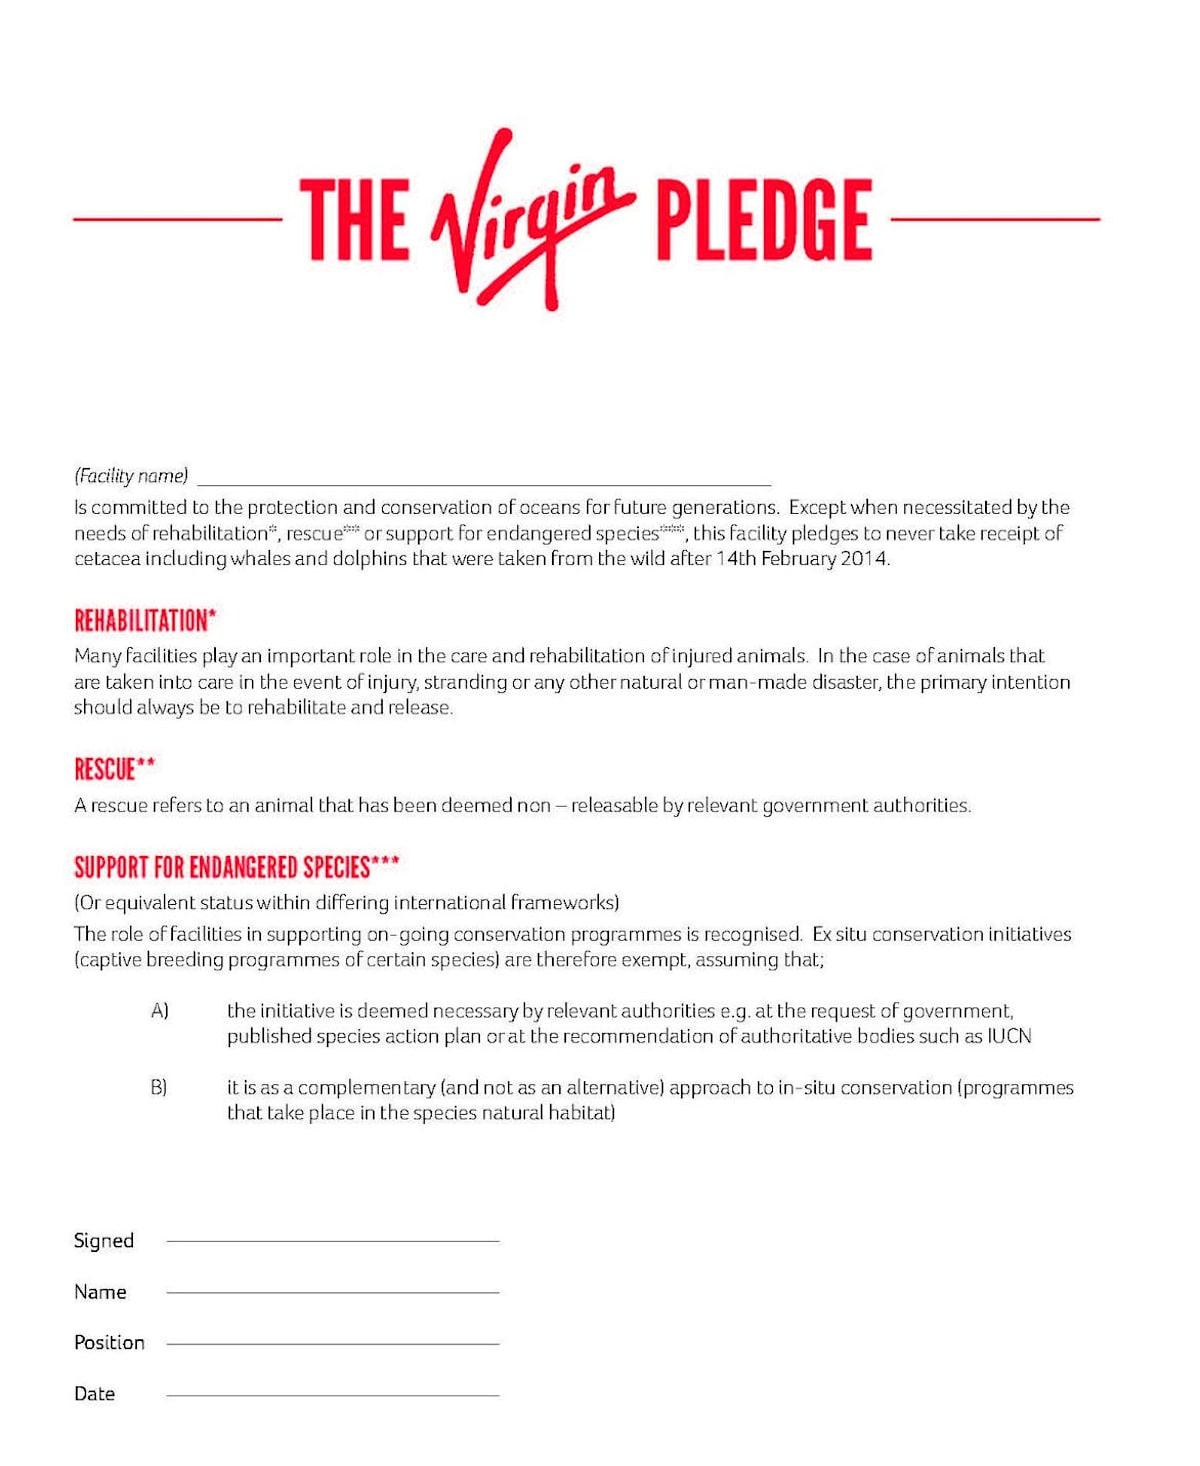 Amusing pledges of virginity advise